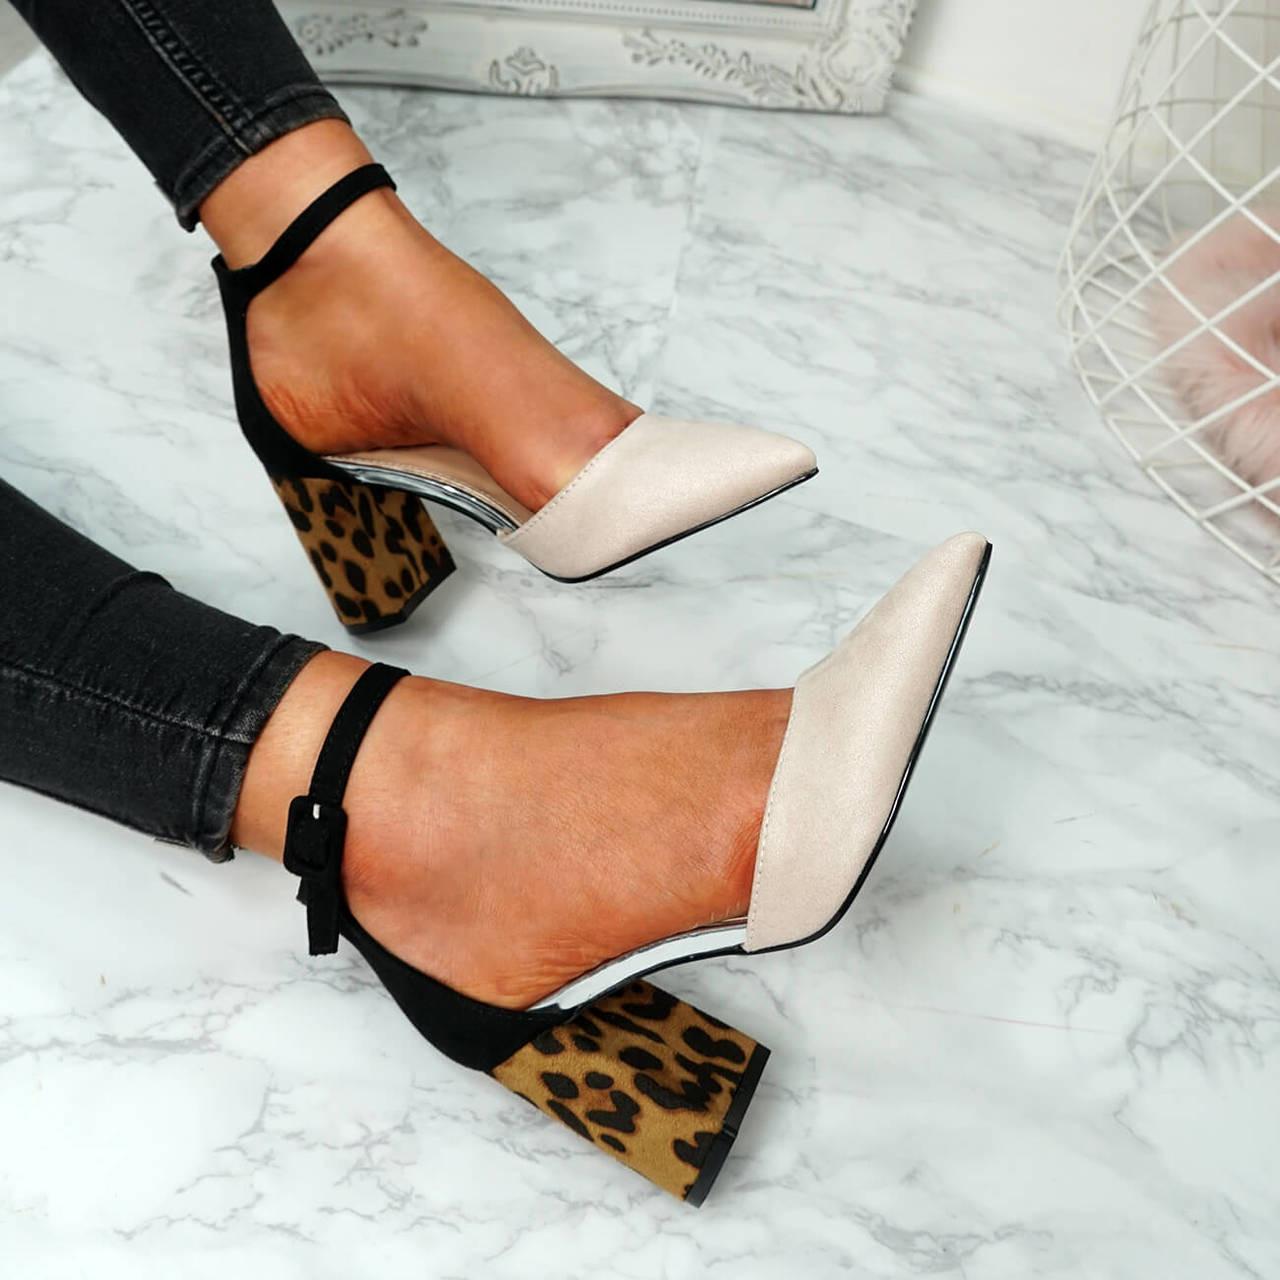 de920013f356 Womens Ladies Ankle Strap Block Heel Leopard Pumps Pointed Toe Shoes Size Uk